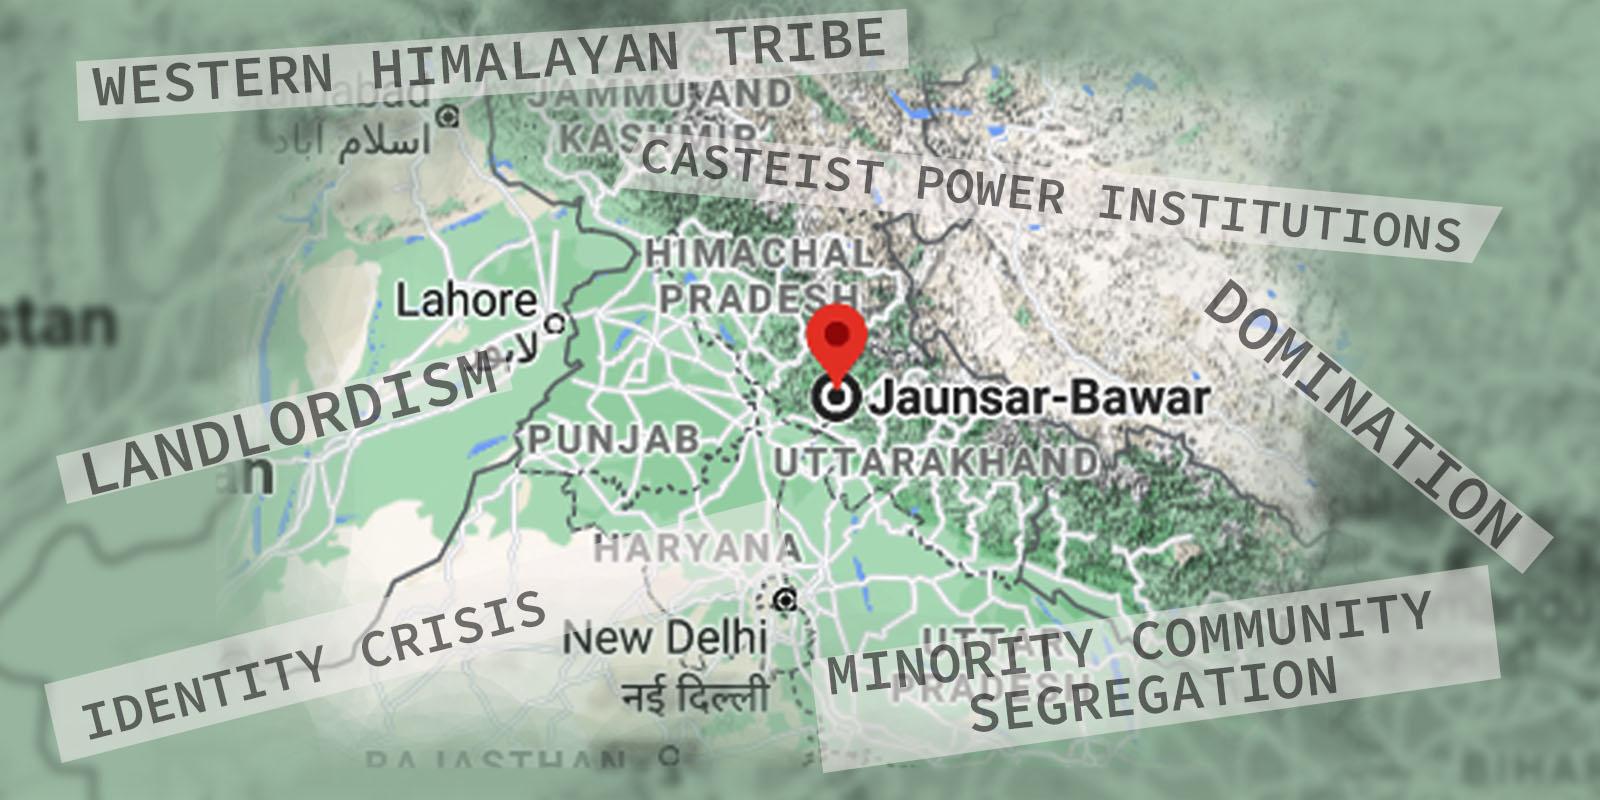 jhaunsar western himalayan tribe